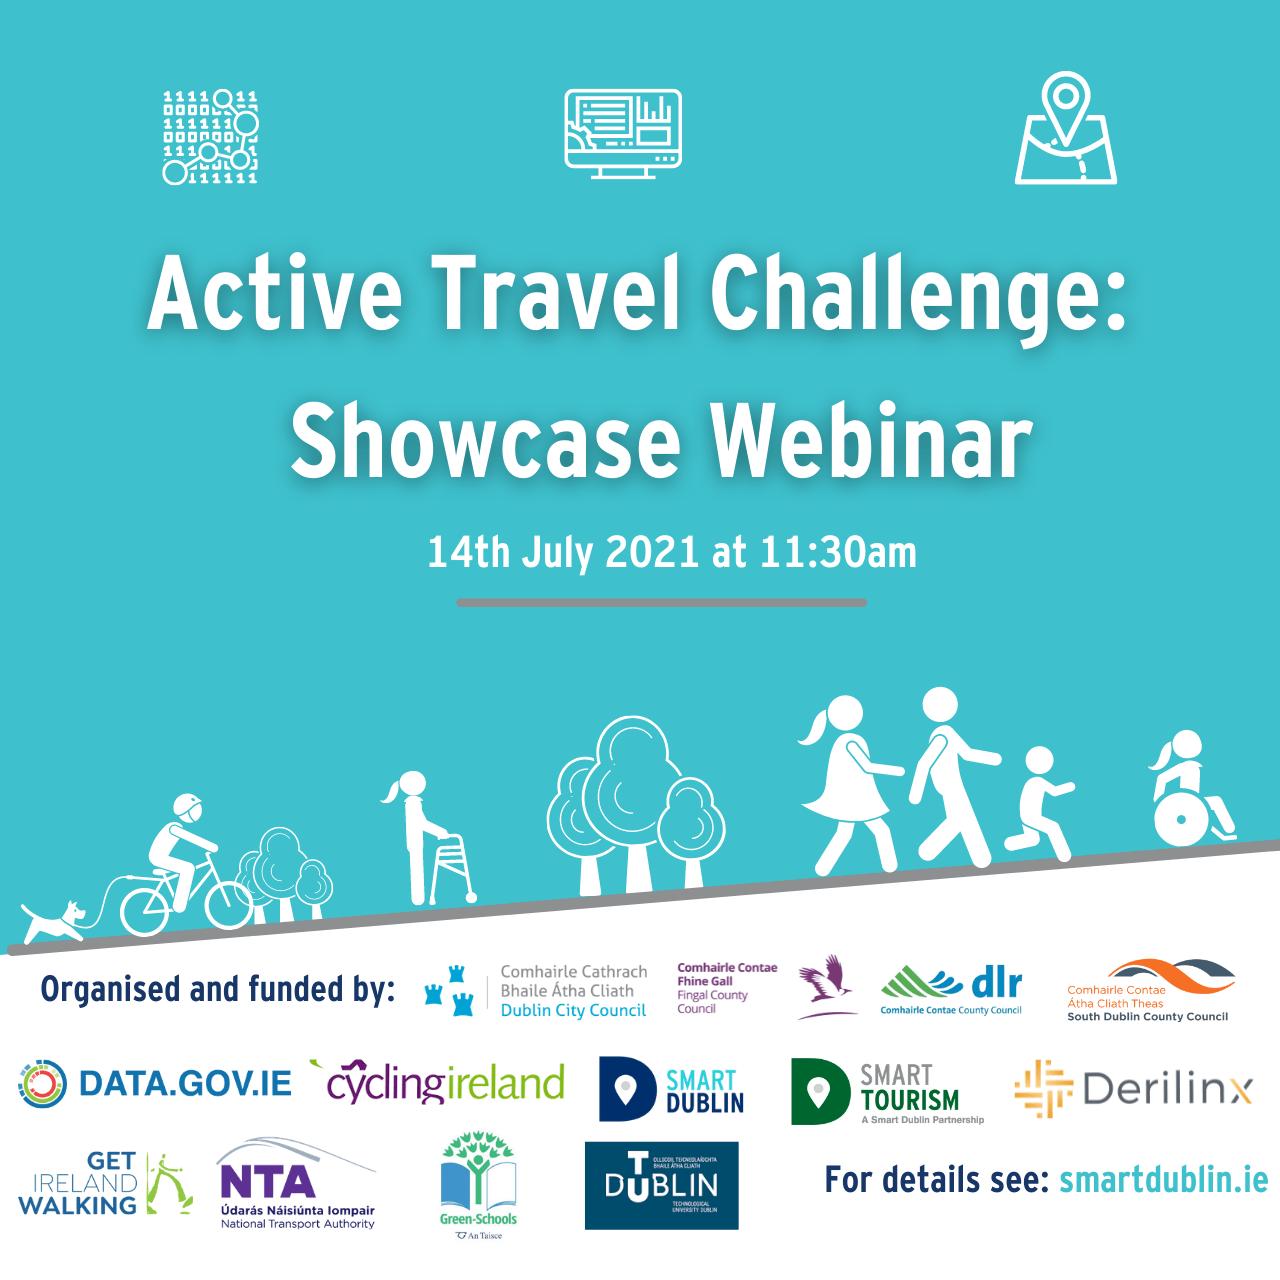 Active Travel Challenge: ShowcaseWebinar